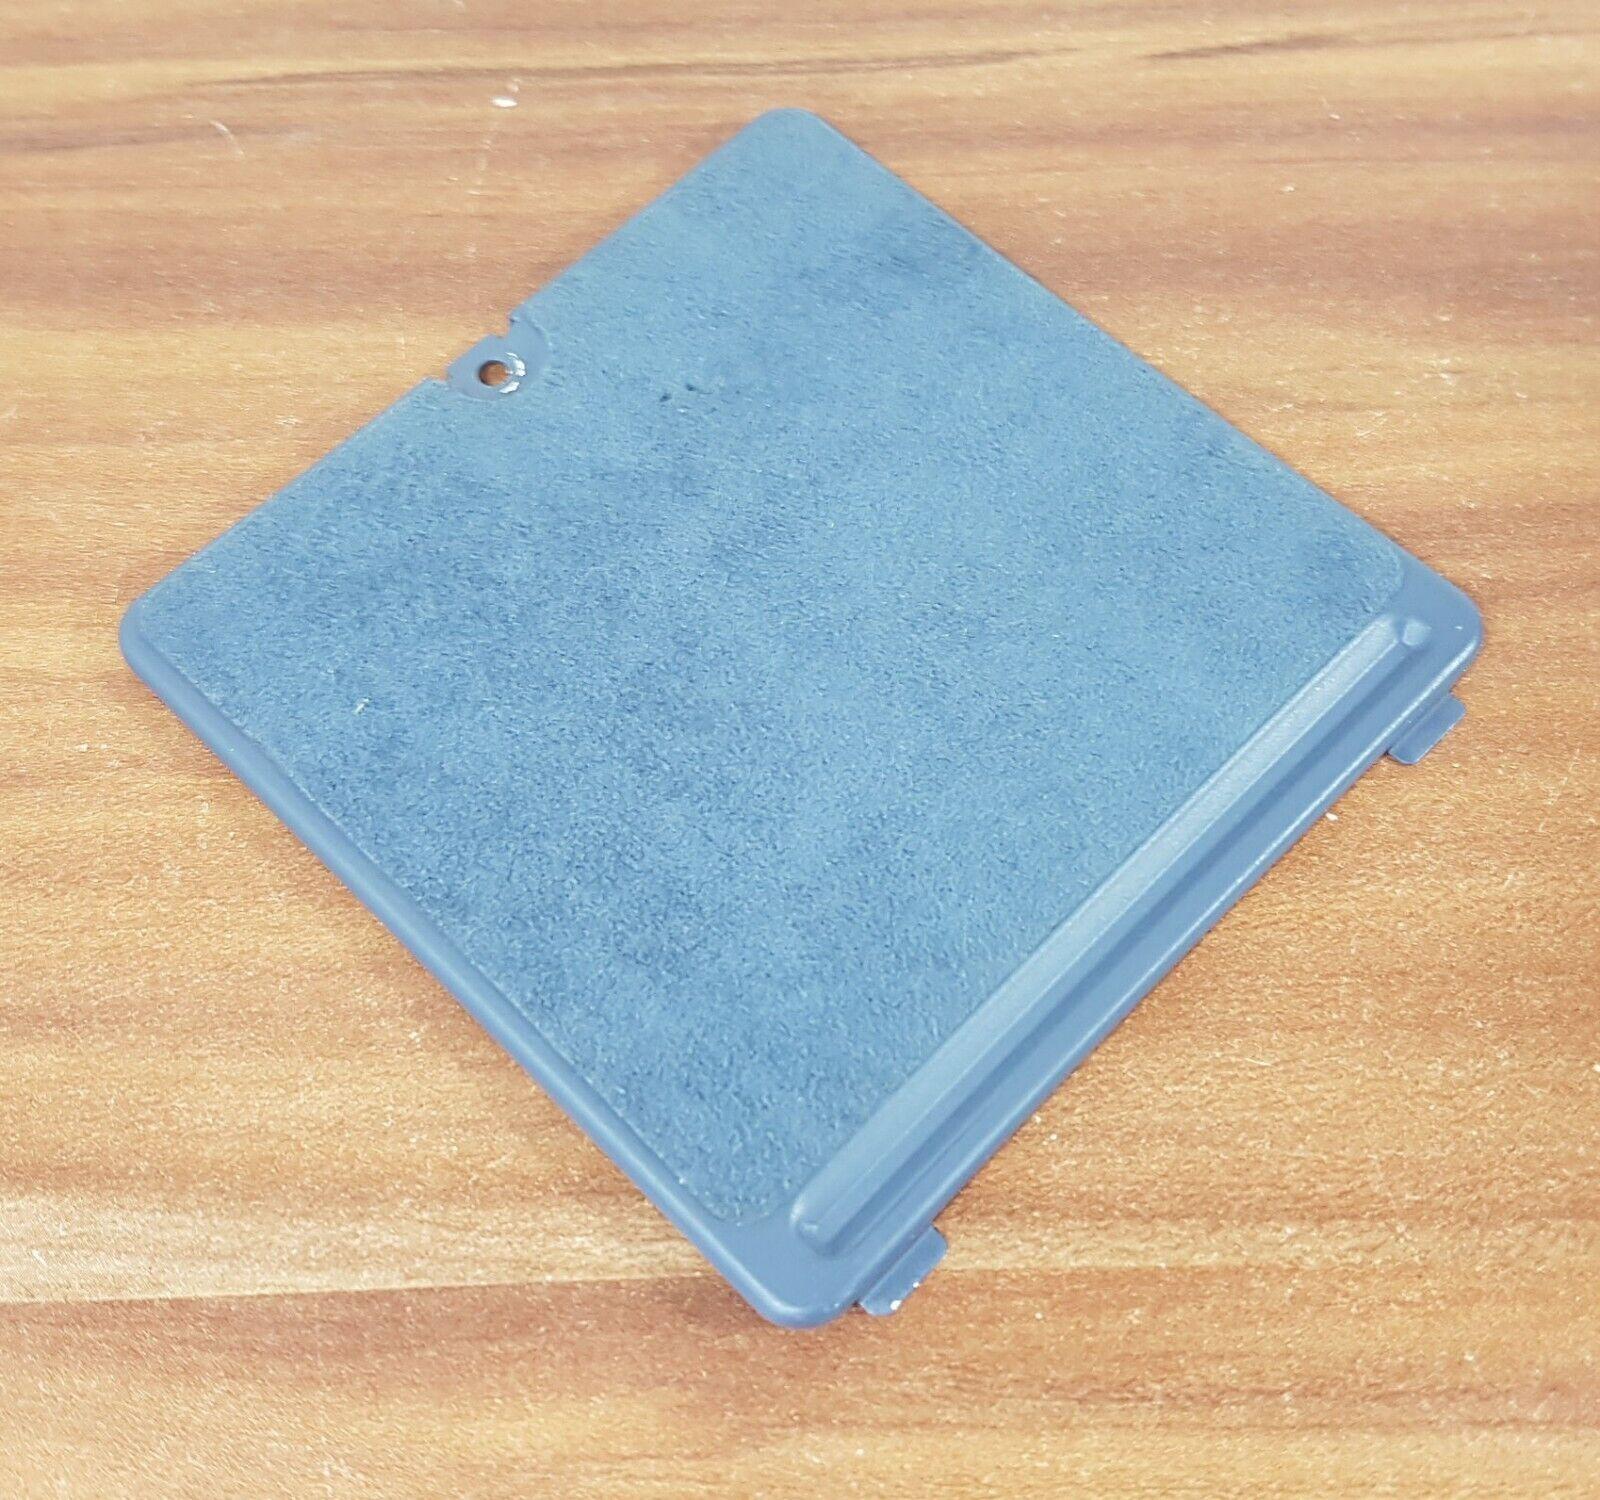 Memory RAM is Cover Cover Door from Fujitsu Lifebook C1110